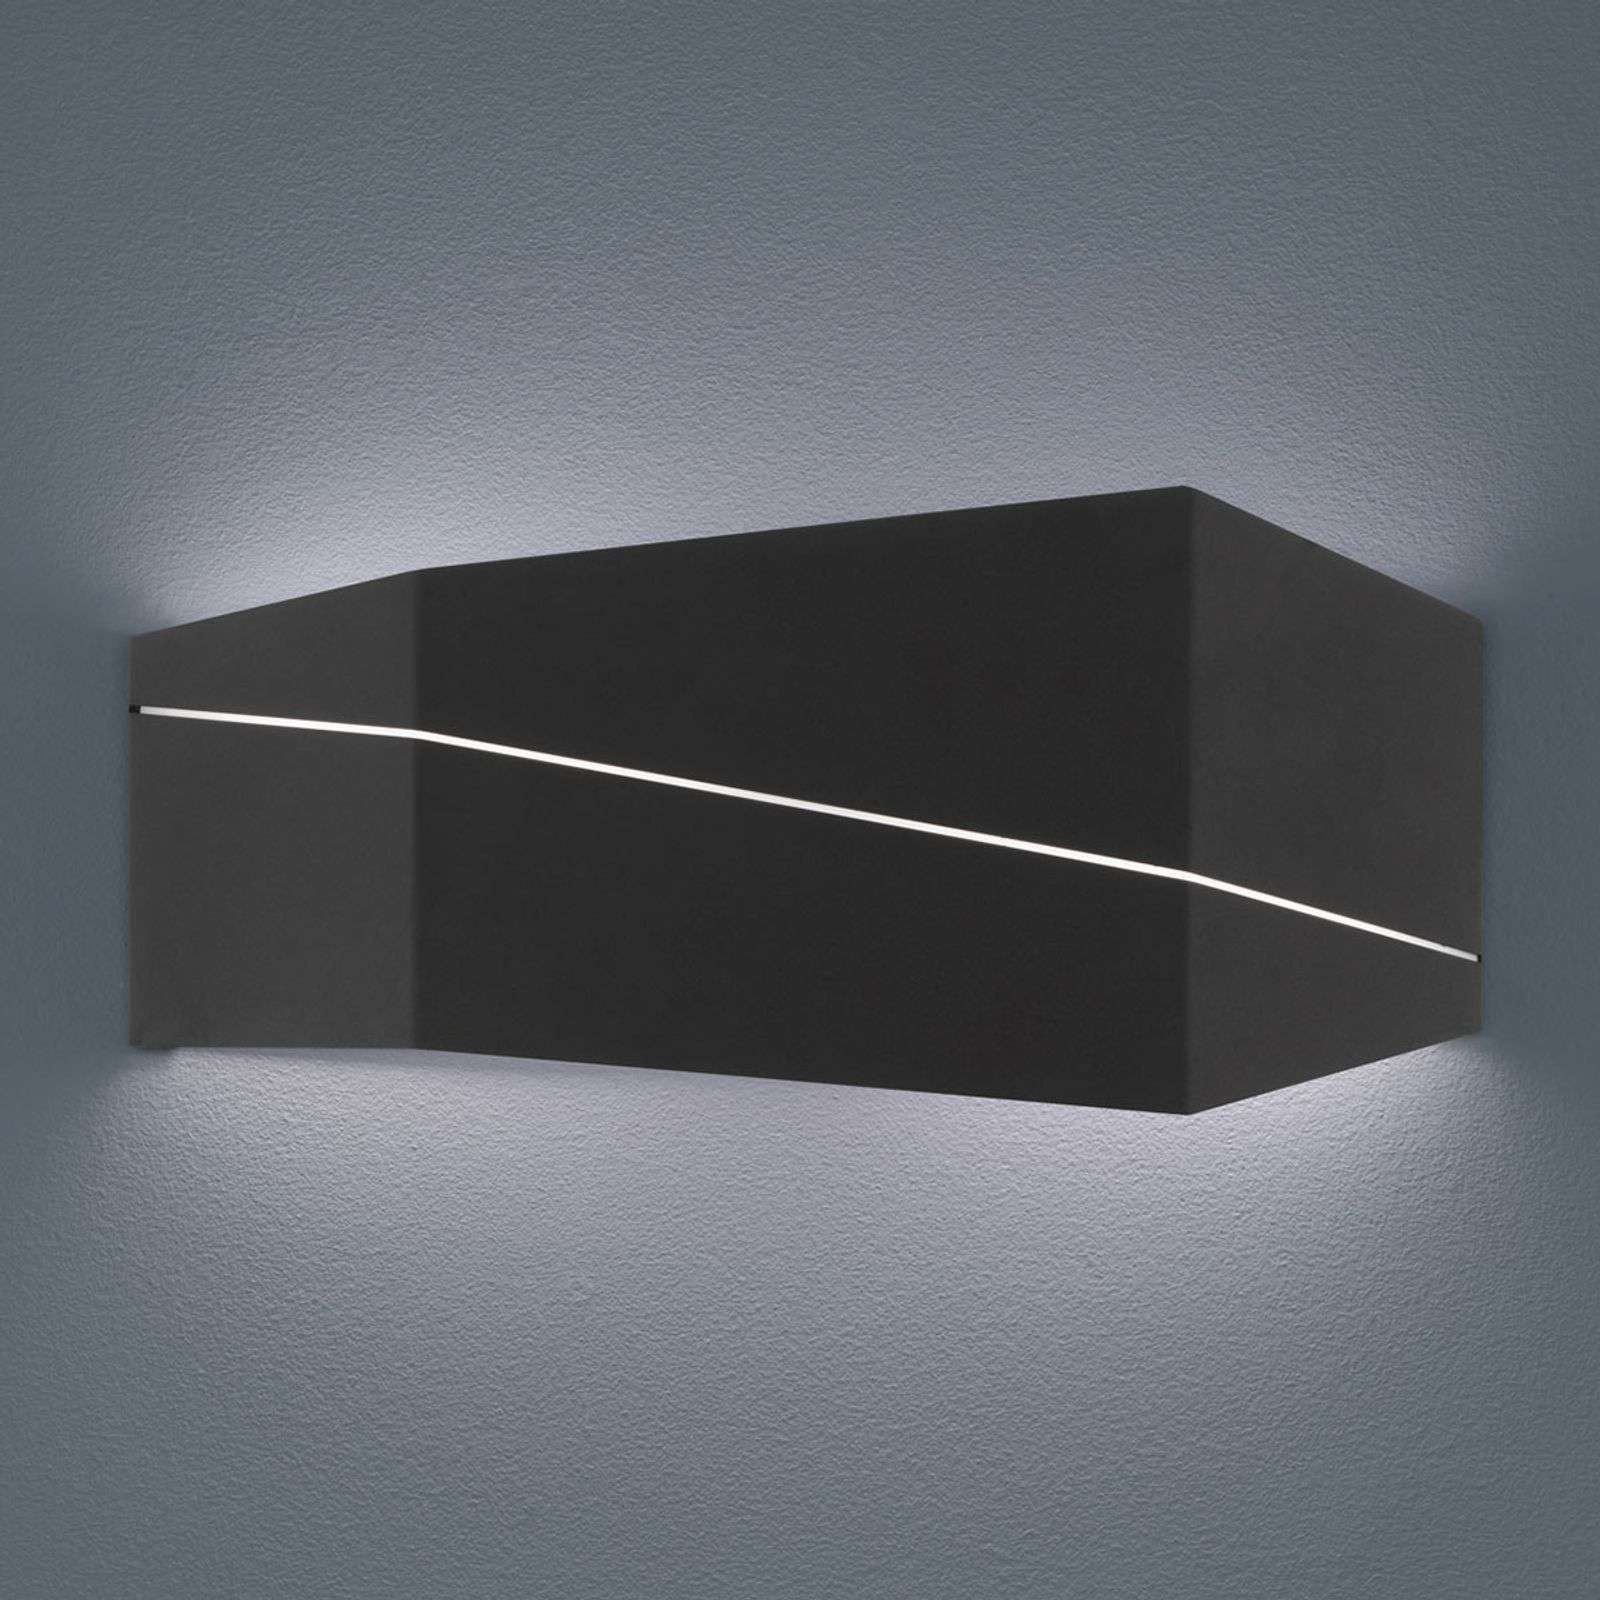 Zorro Applique Led Moderne En Noir Mat Wandlamp Led Badkamer Gamma